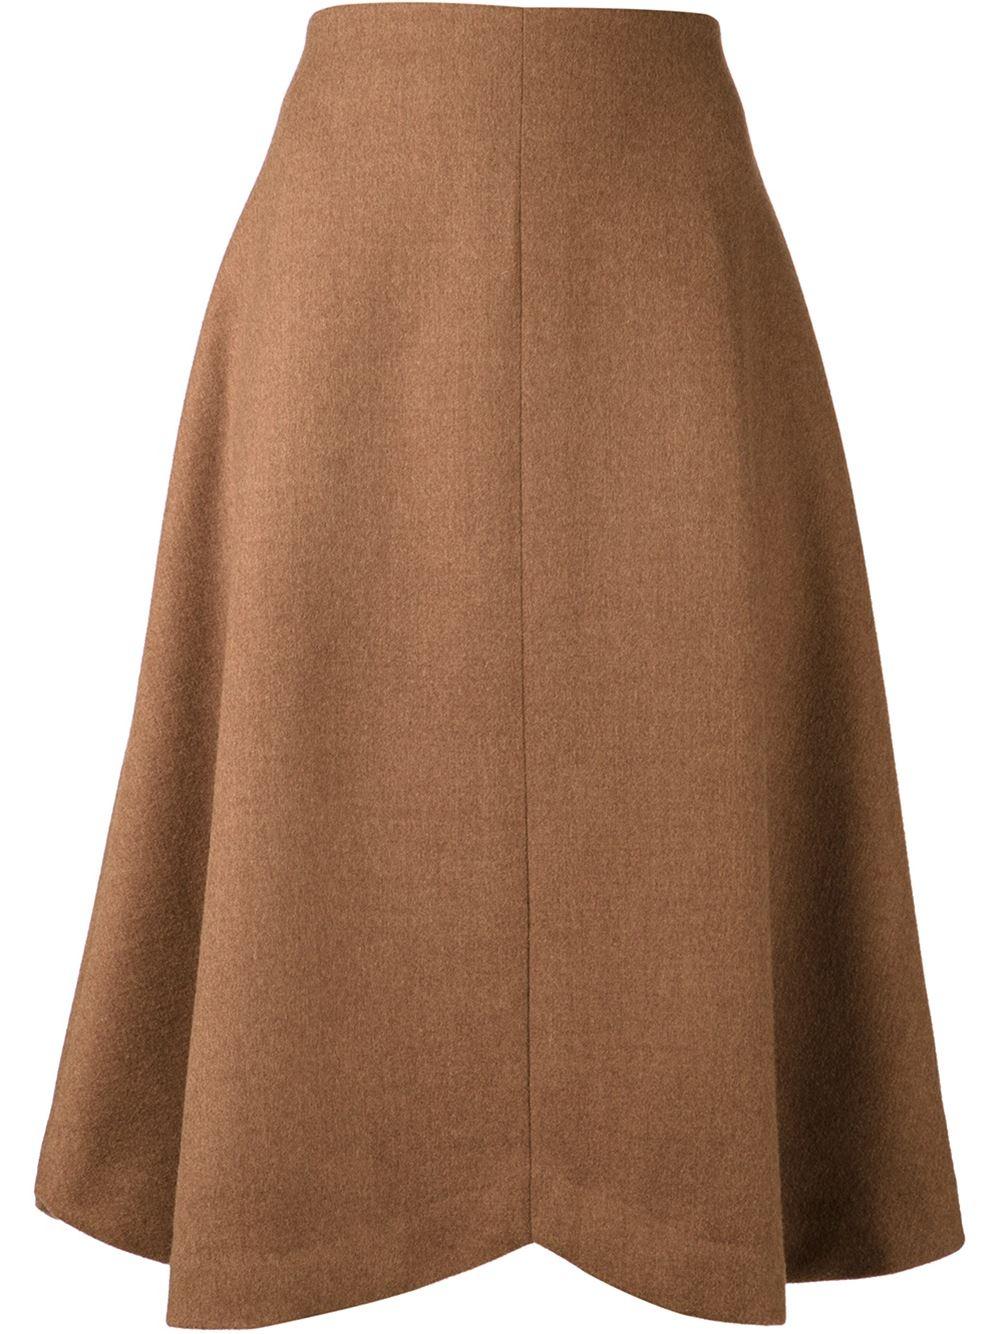 Brown Aline Skirt 73